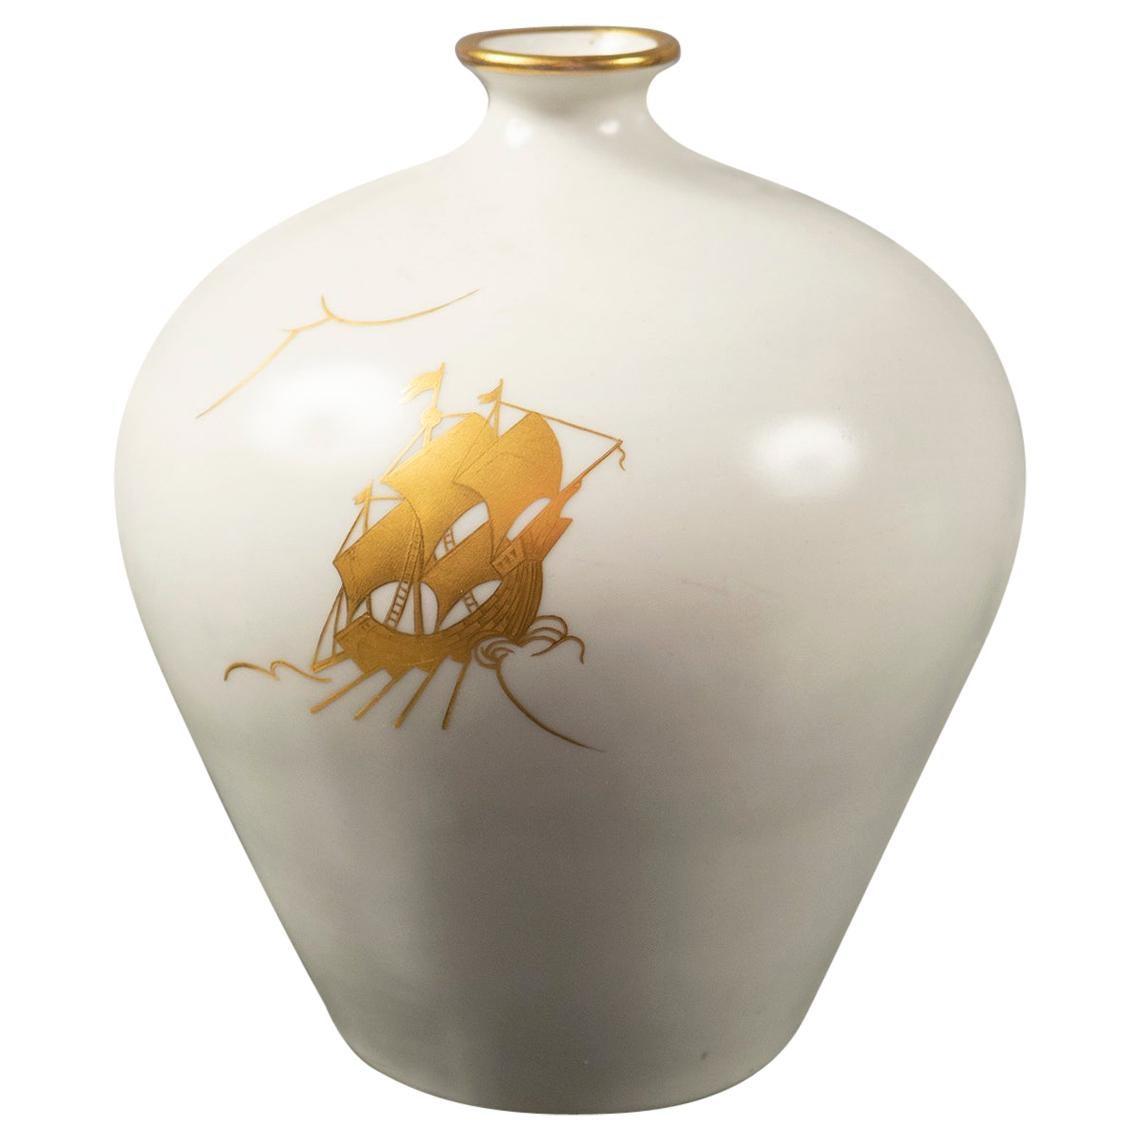 Ceramic Vase by Giovanni Gariboldi for Richard Ginori, Italy, 1940s